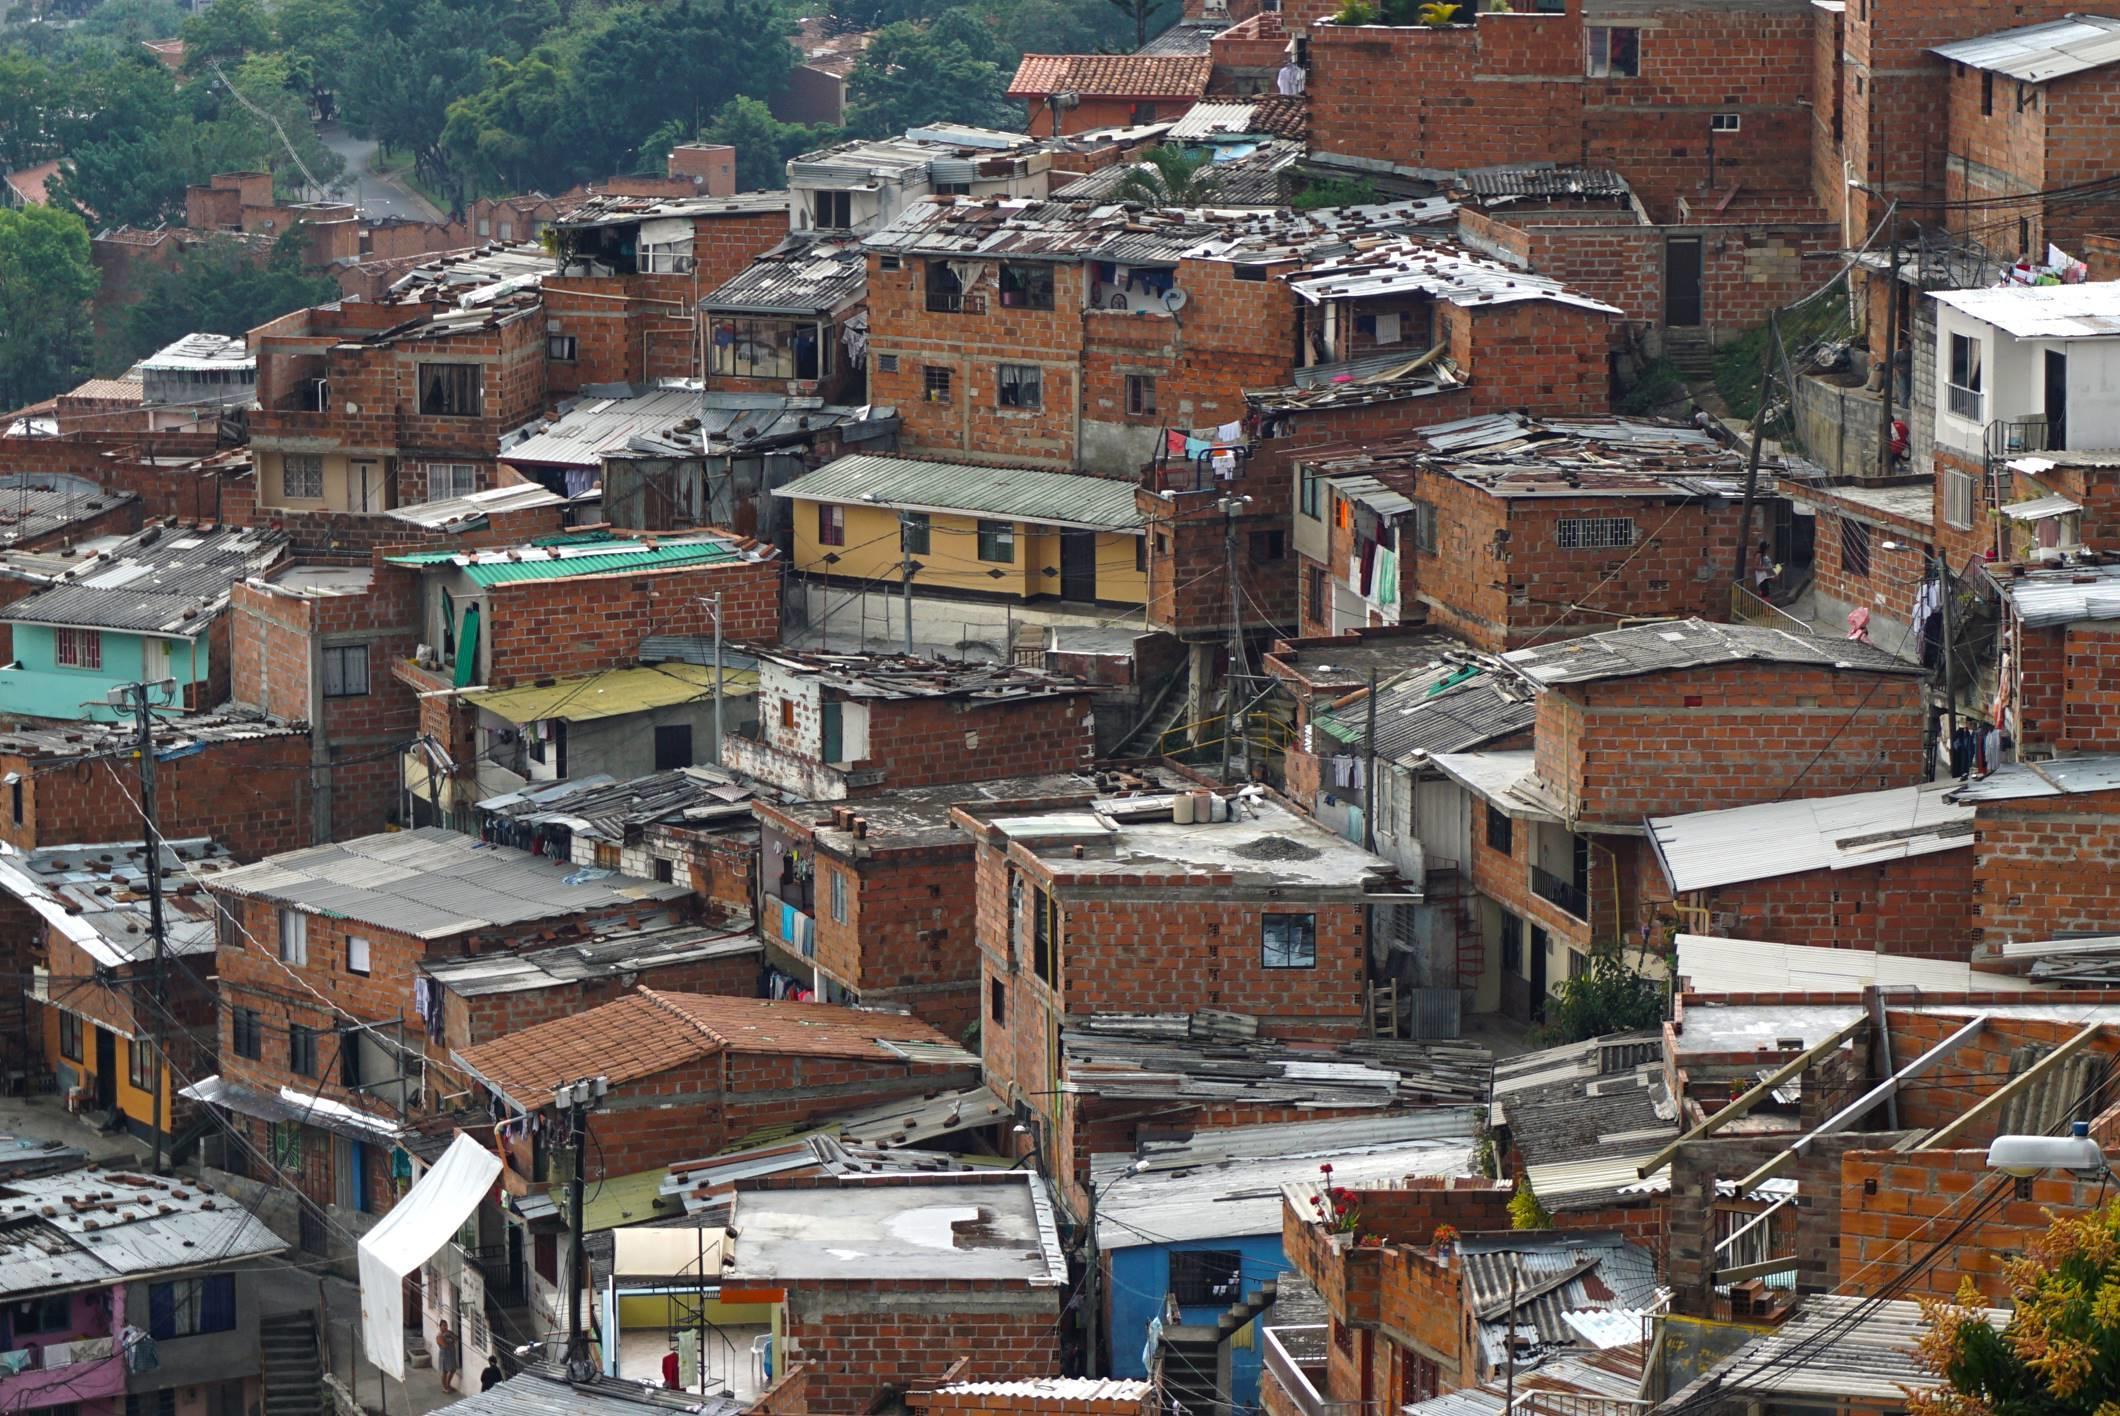 Typické obydlia v Medelline.